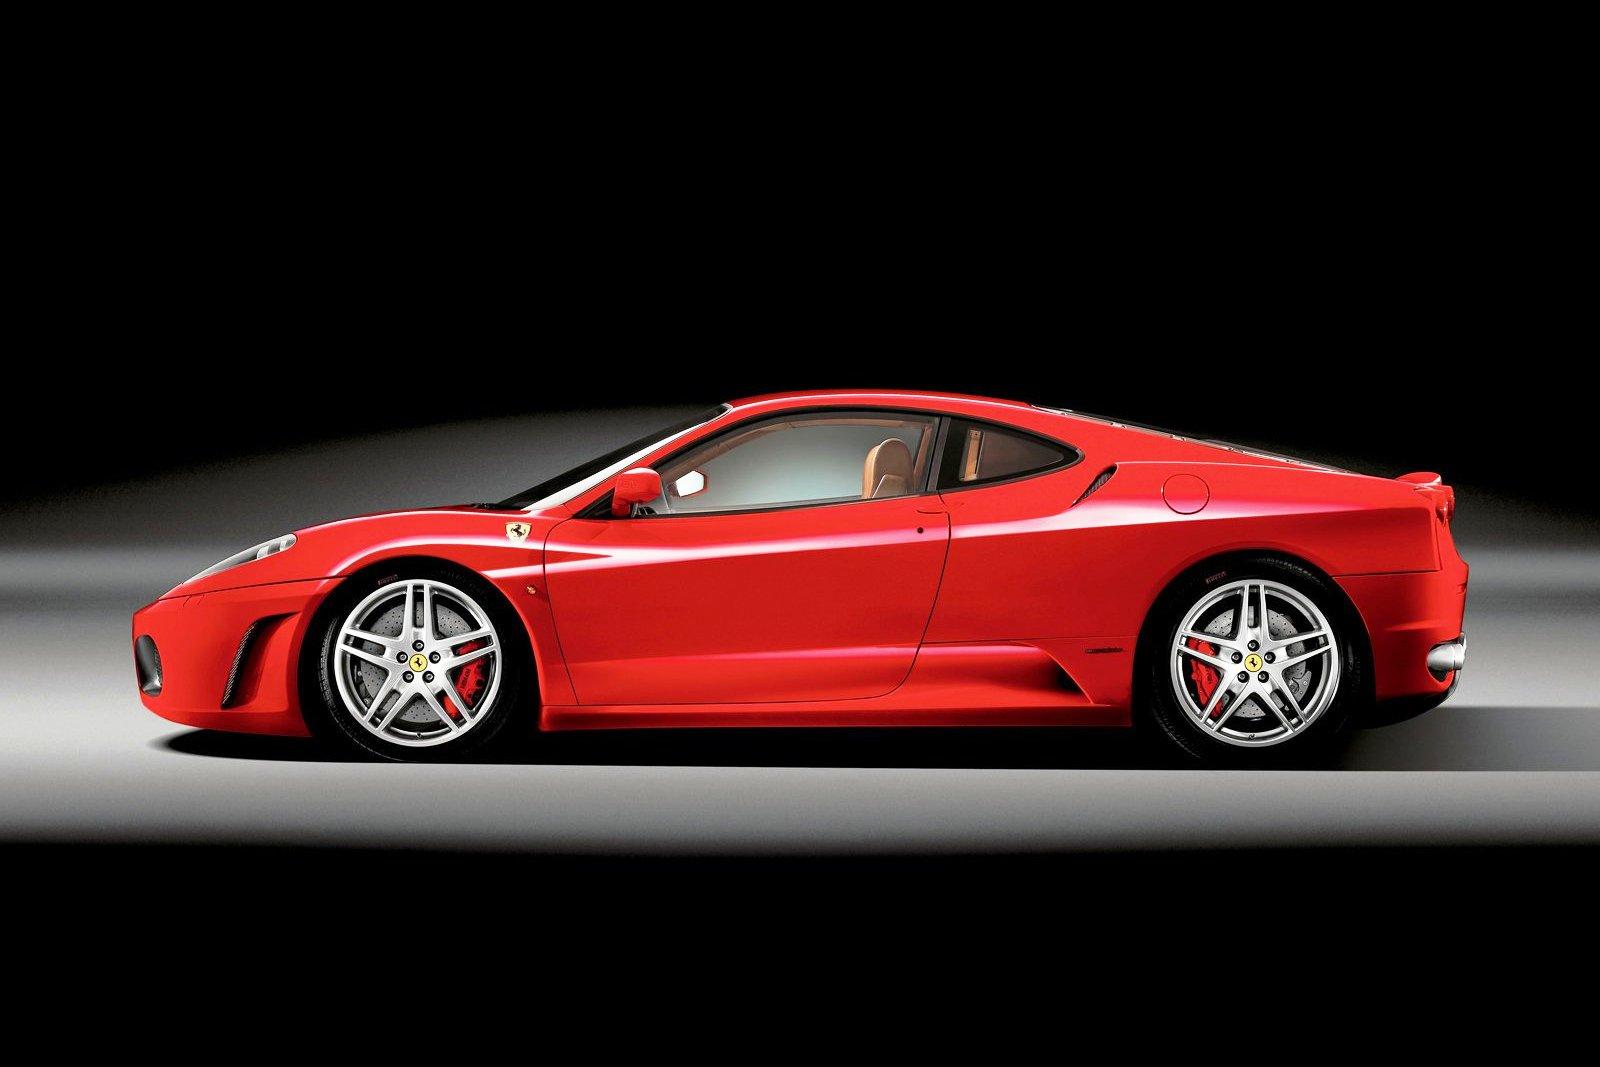 Ferrari F430 - Car Pictures, Images – GaddiDekho.com